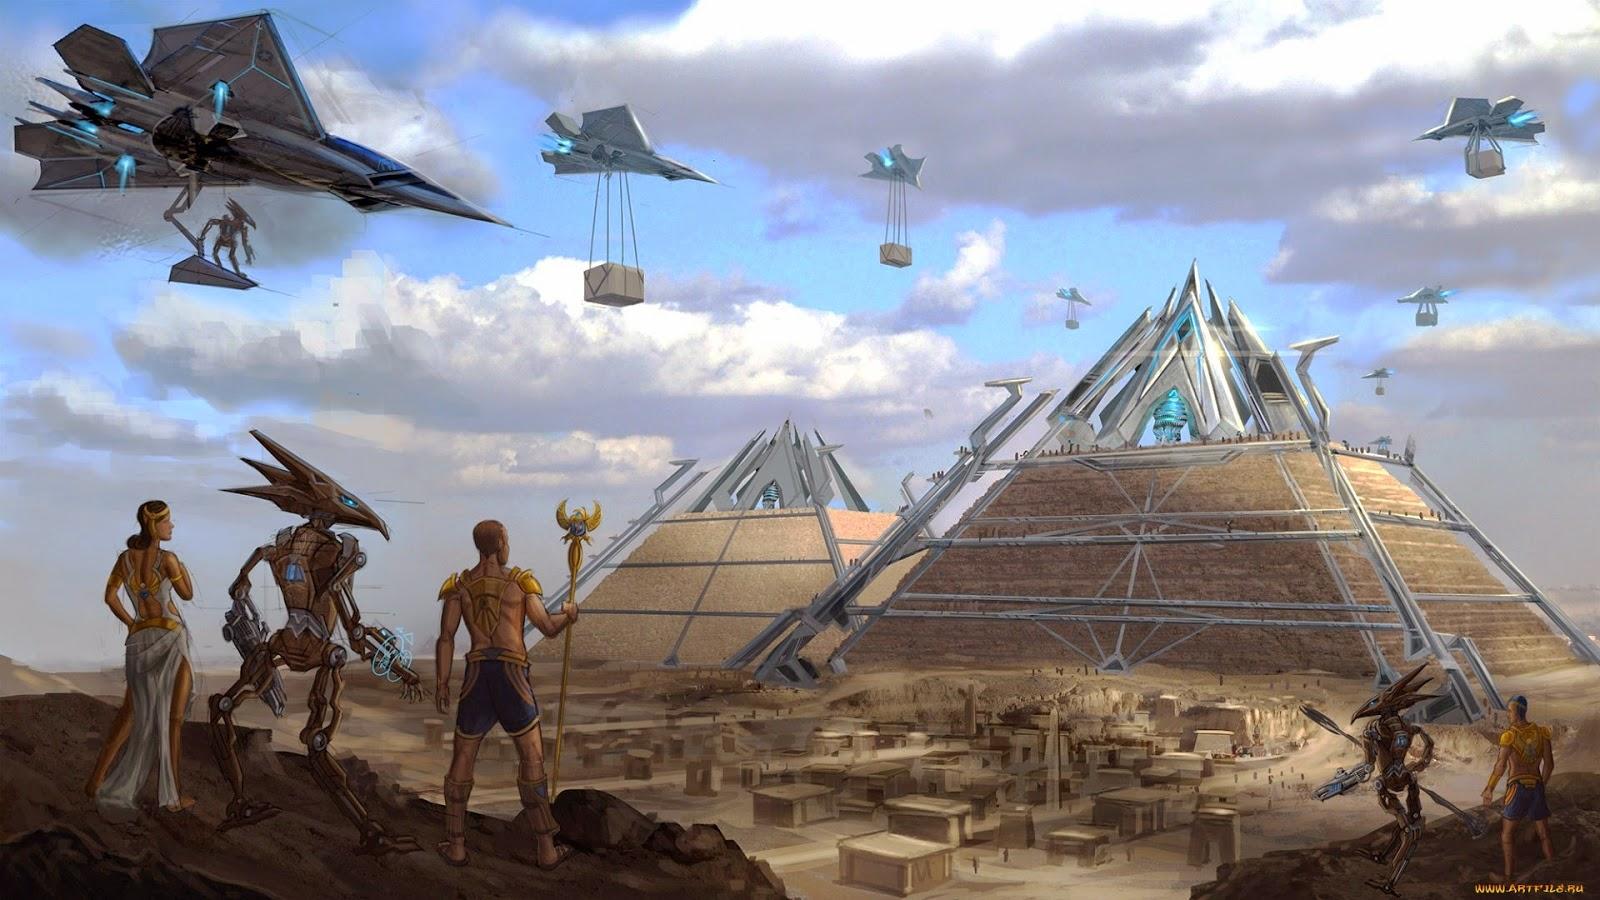 ALIEN-BUILDERS-SUPERVISING-EGYPTIAN-GIZA